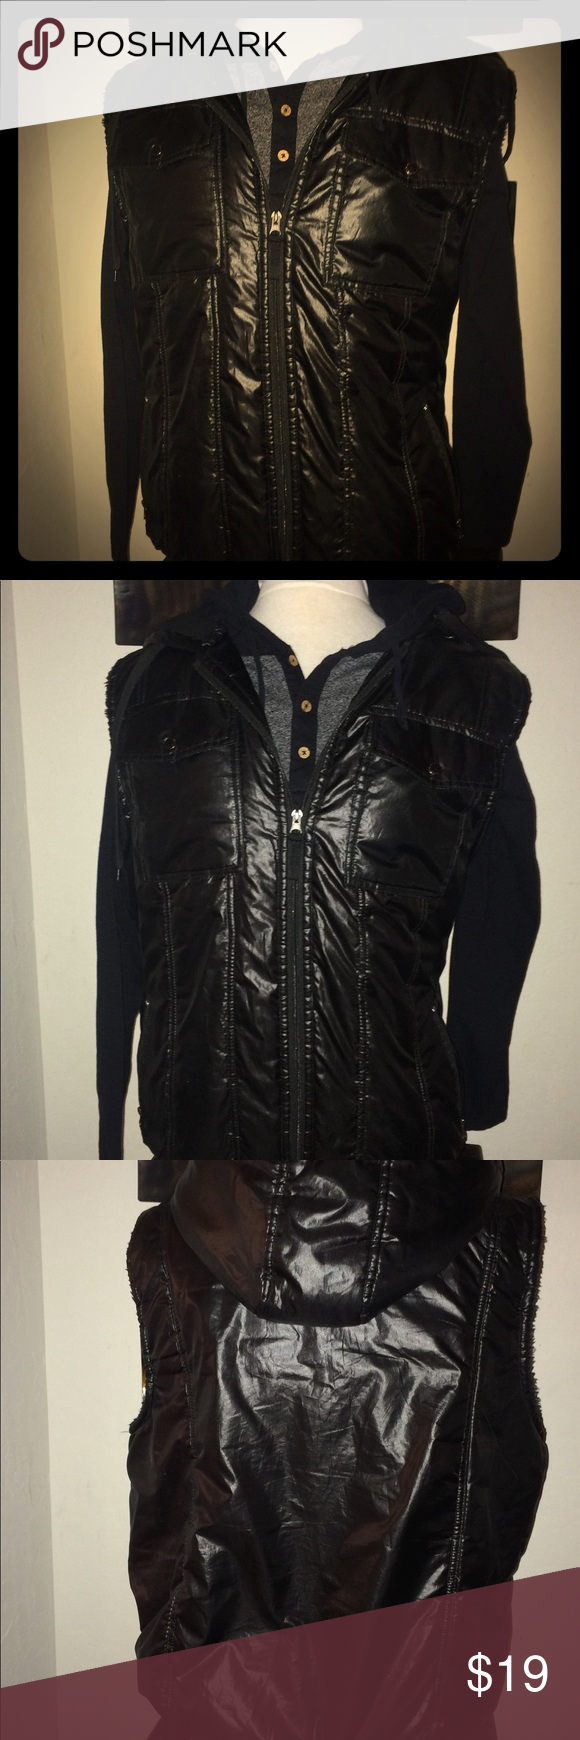 315dbca8df71c Courage clothing co Black puffer vest men's XL Men's Courage Clothing Co Sz  Xl Black shiny